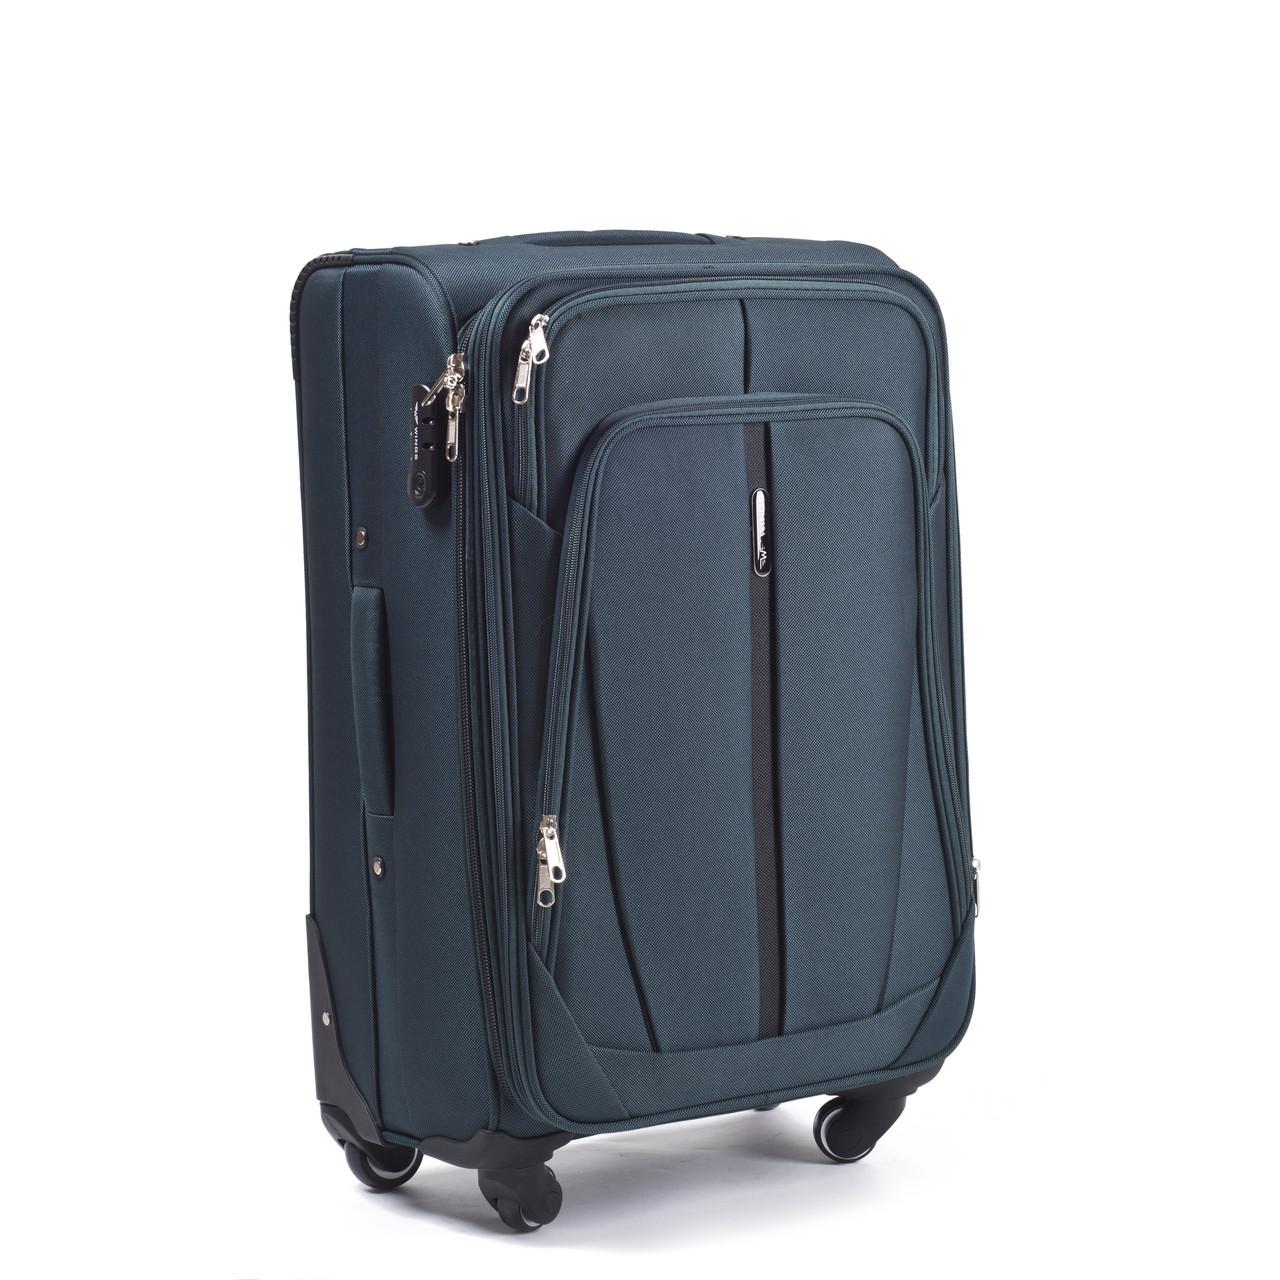 Малый тканевый чемодан Wings 1706 на 4 колесах зеленый